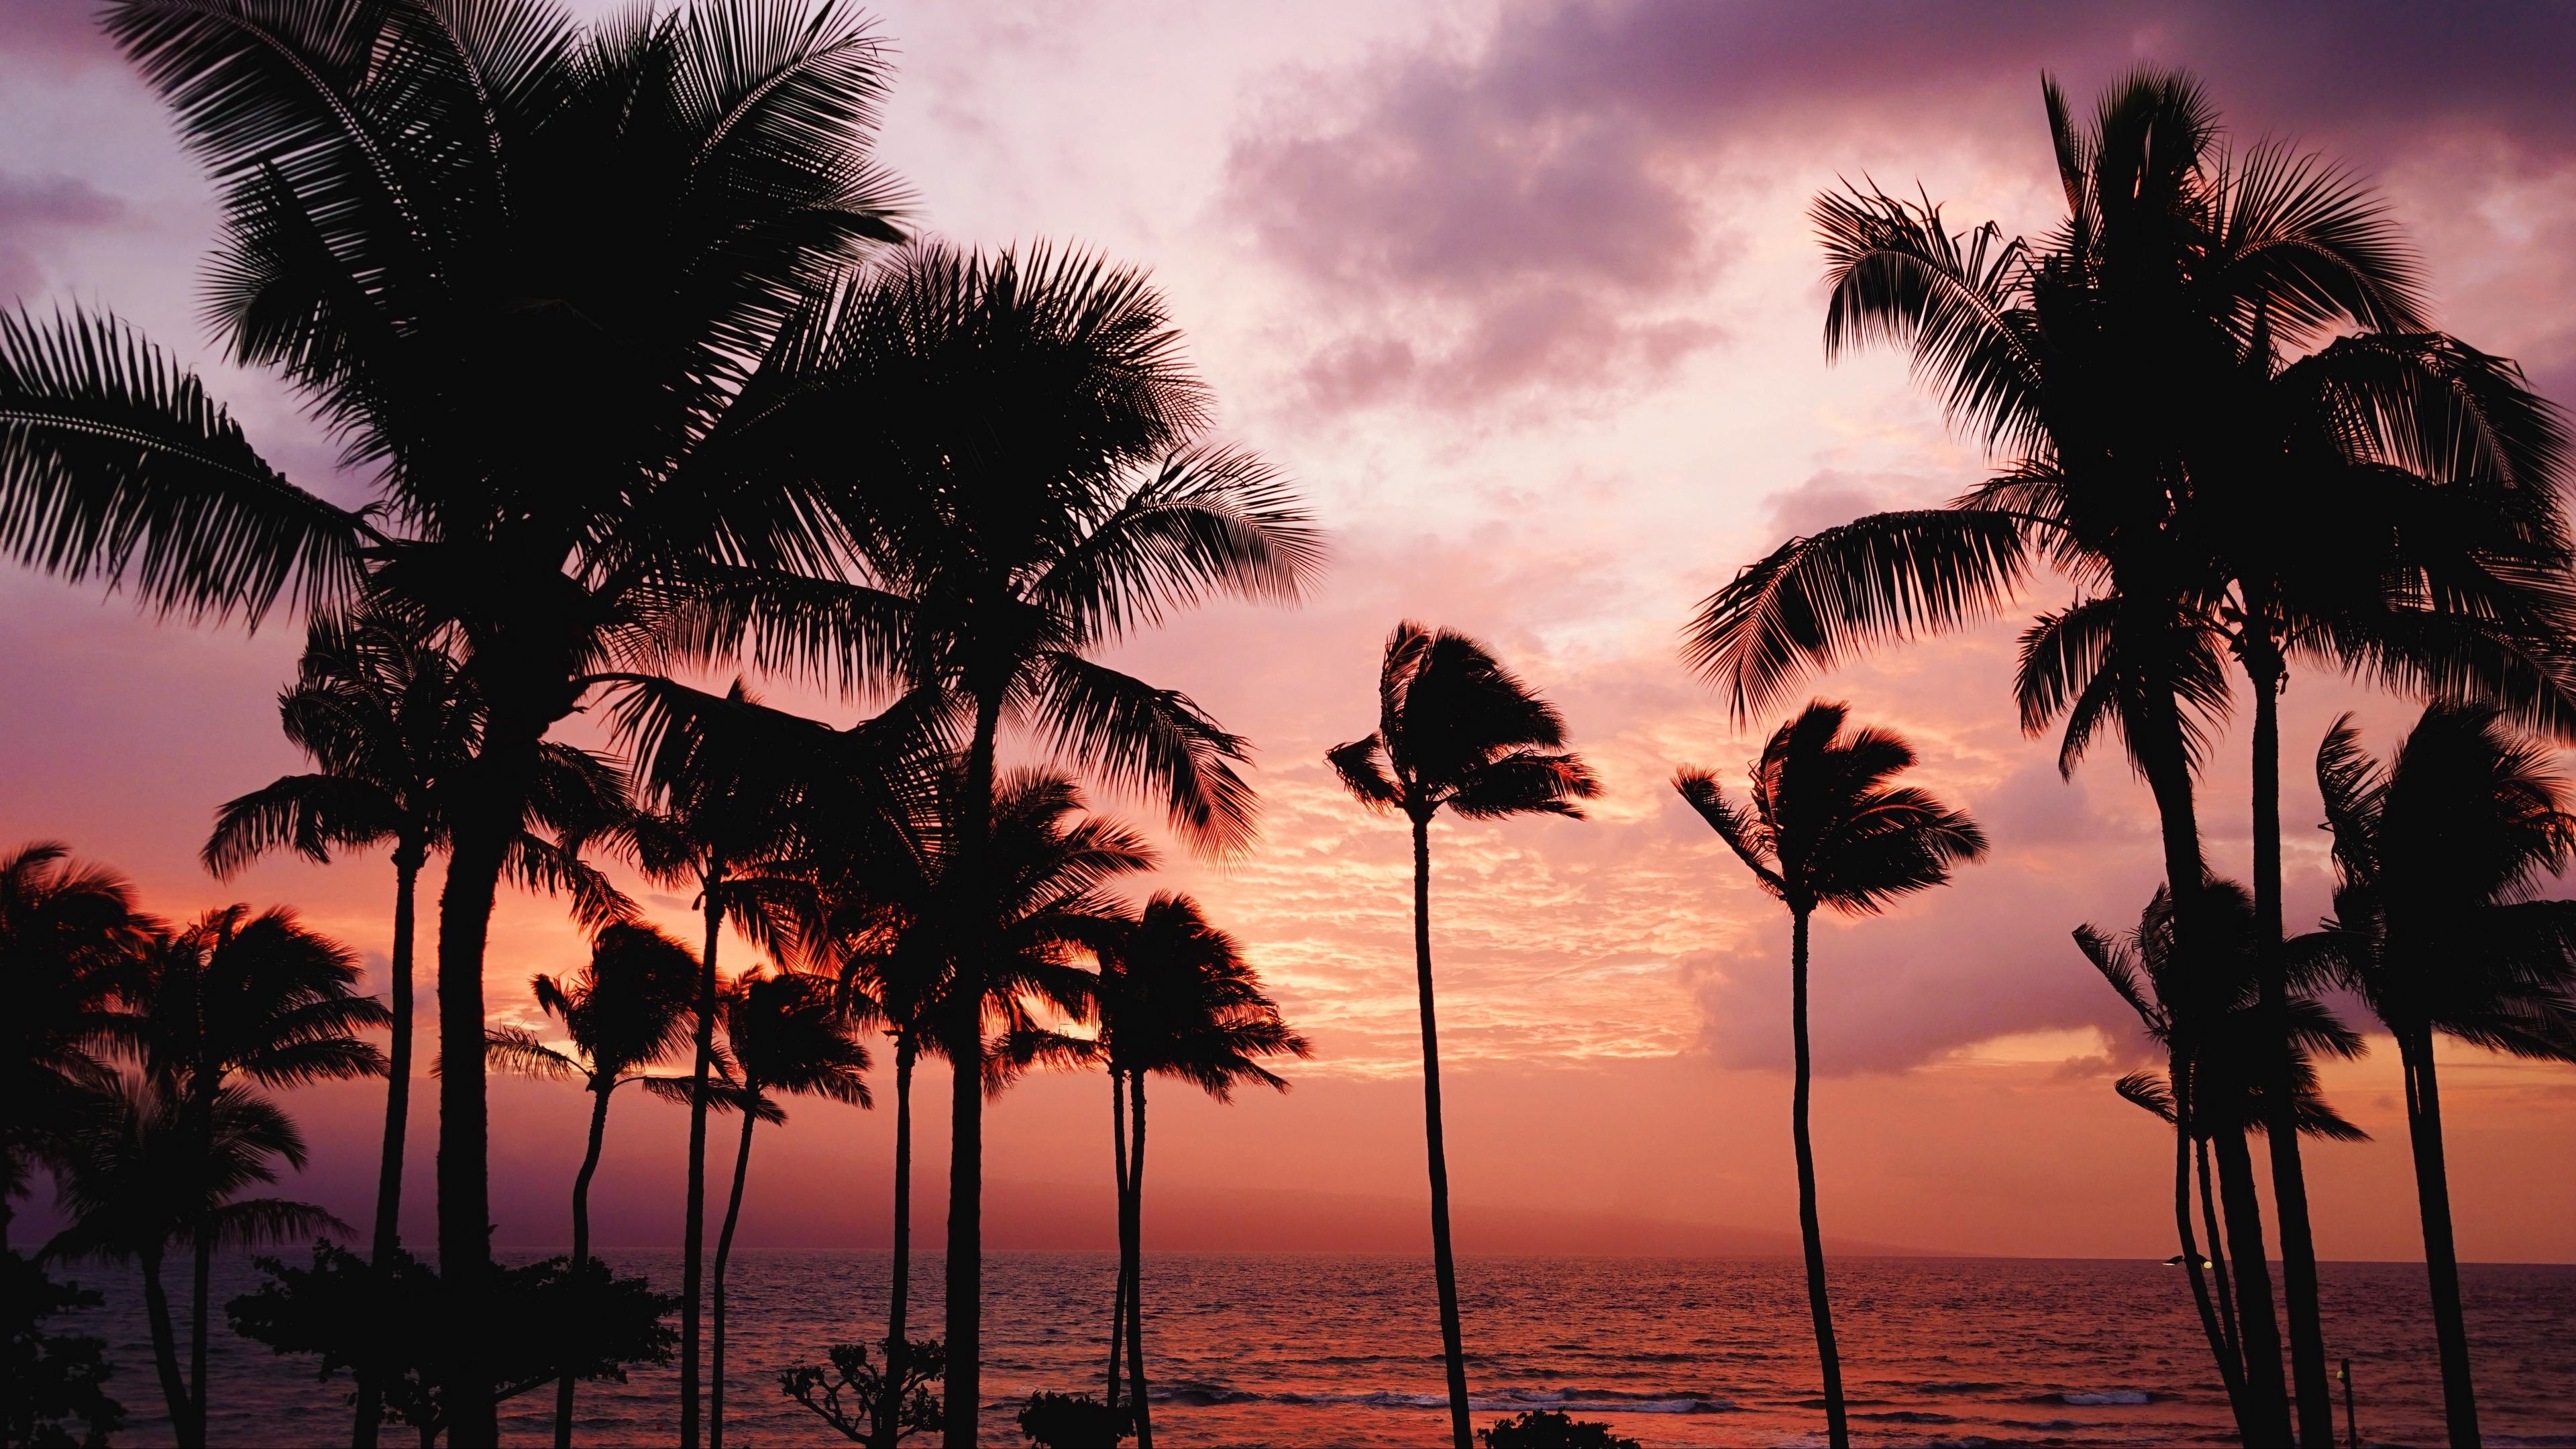 palm trees sunset sea 4k 1541117800 - palm trees, sunset, sea 4k - sunset, Sea, palm trees